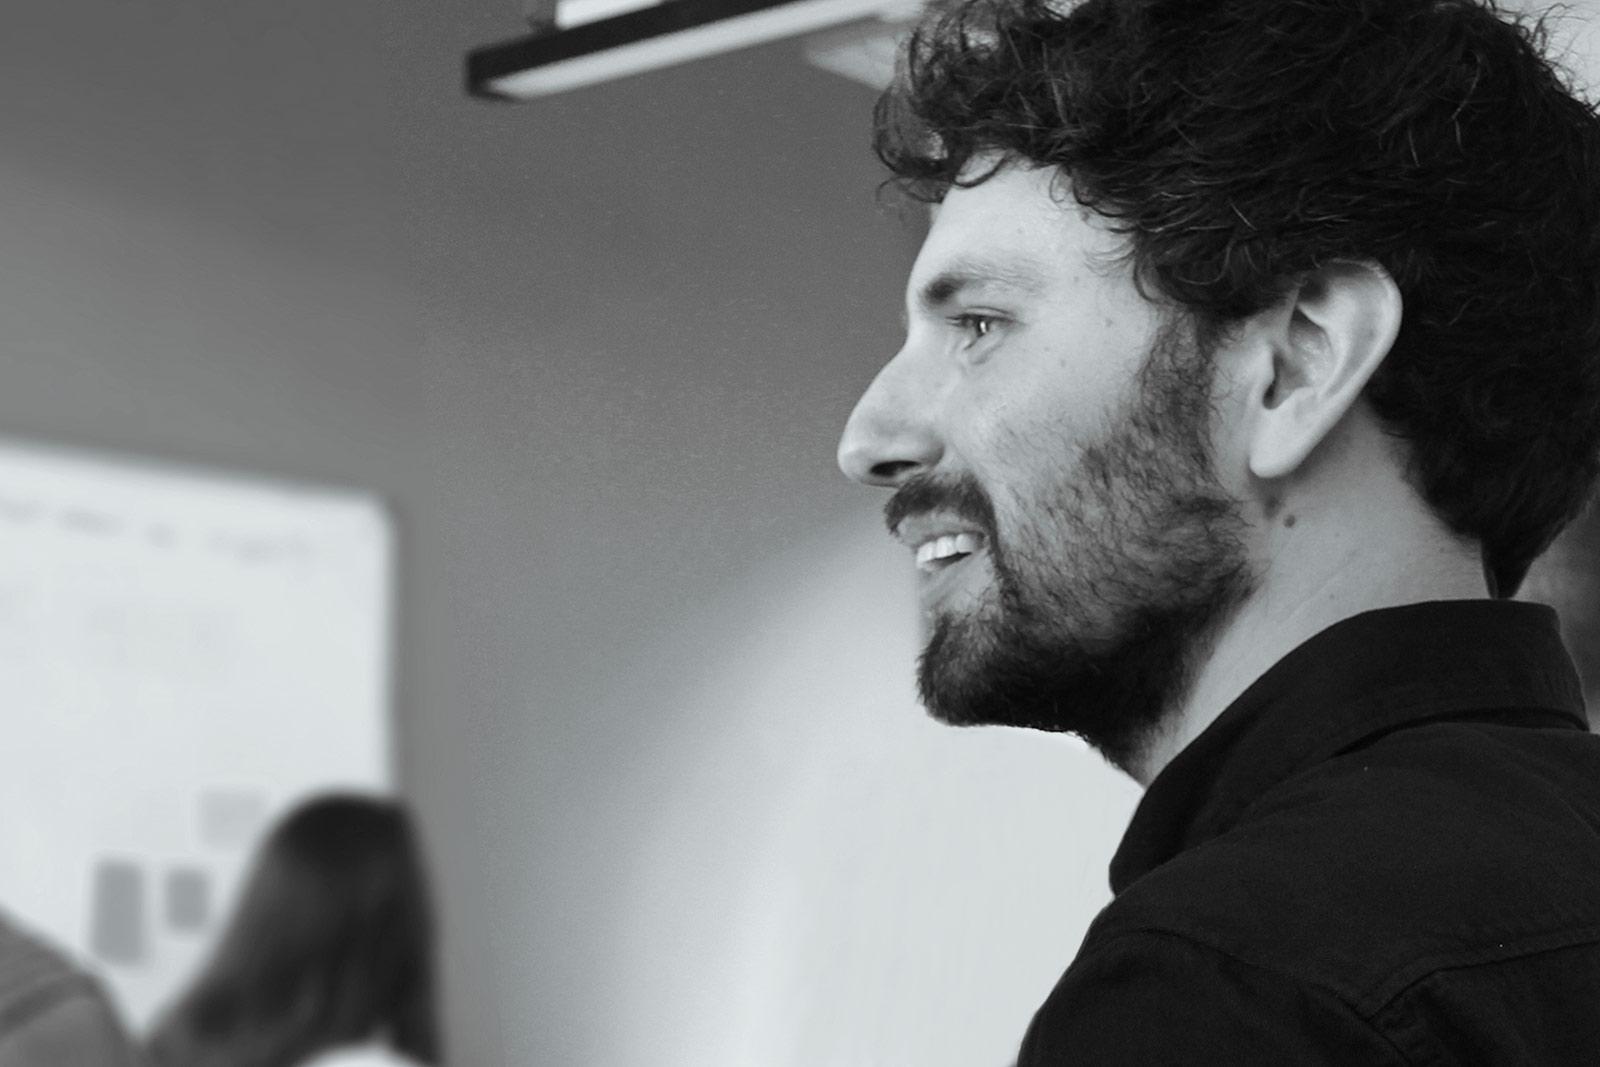 Photograph of Thomas Prior, a digital product designer